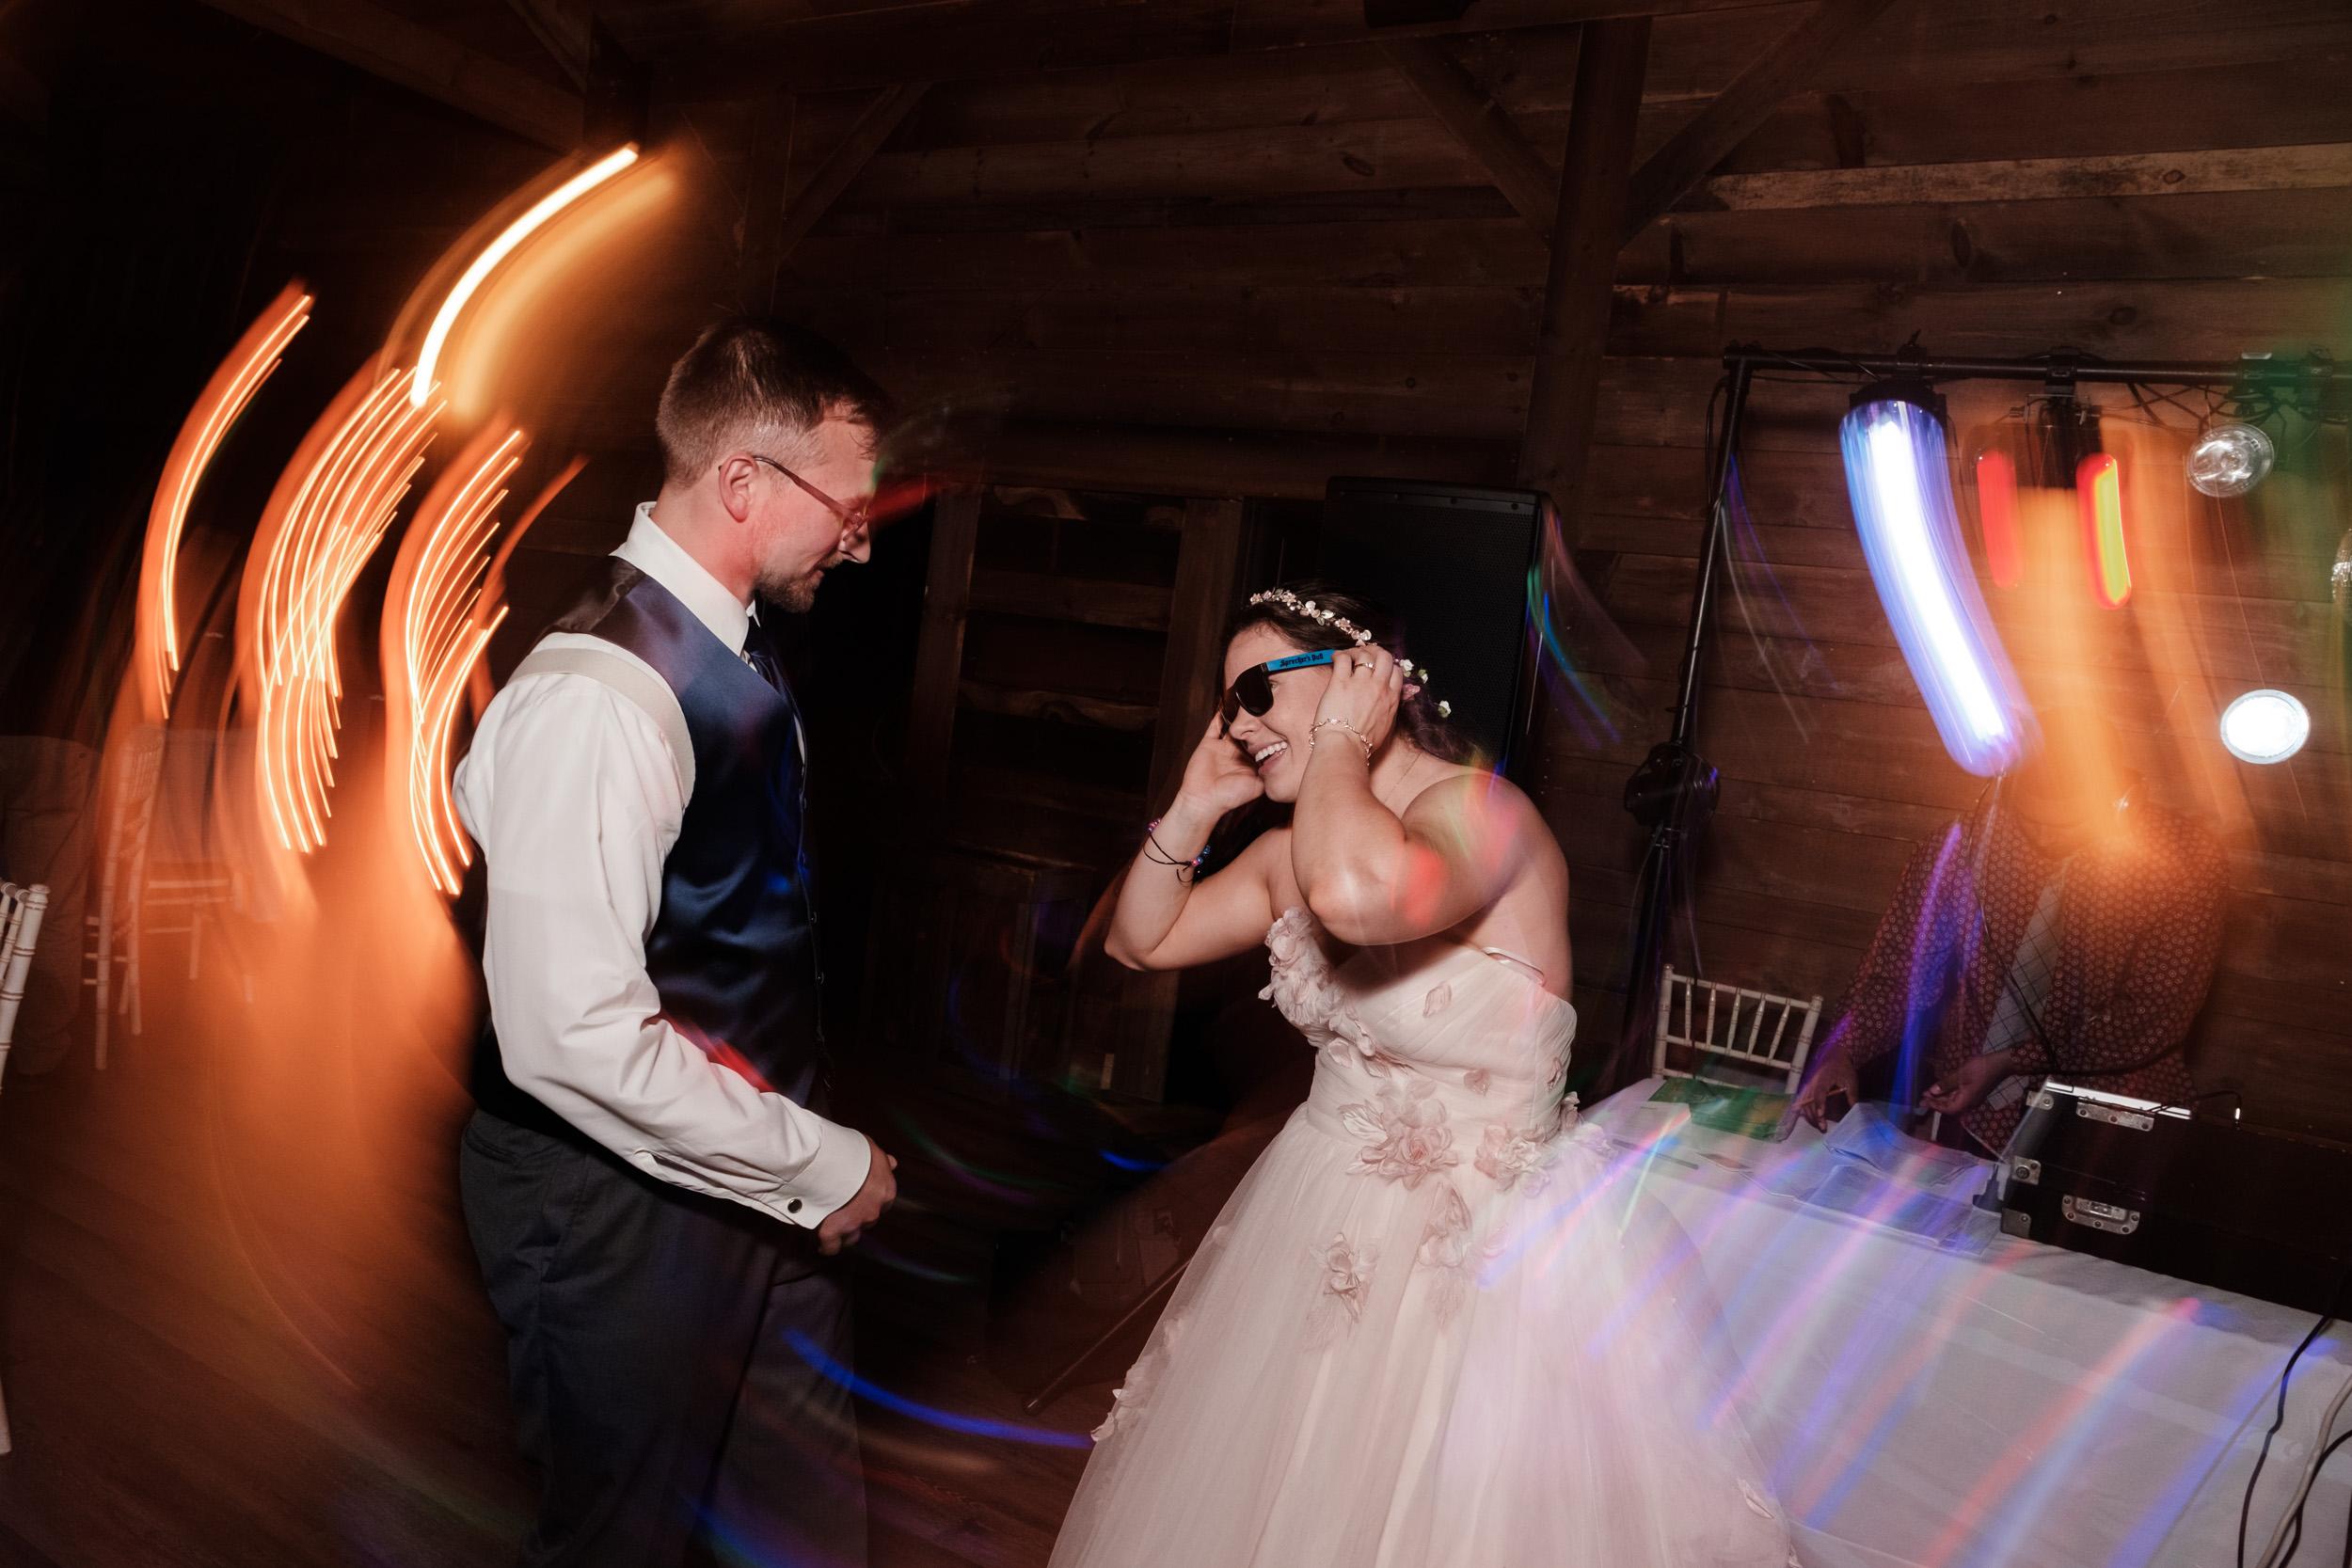 19-06-22-Ryan-Katie-The-Fields-Reserve-Wedding-96.jpg